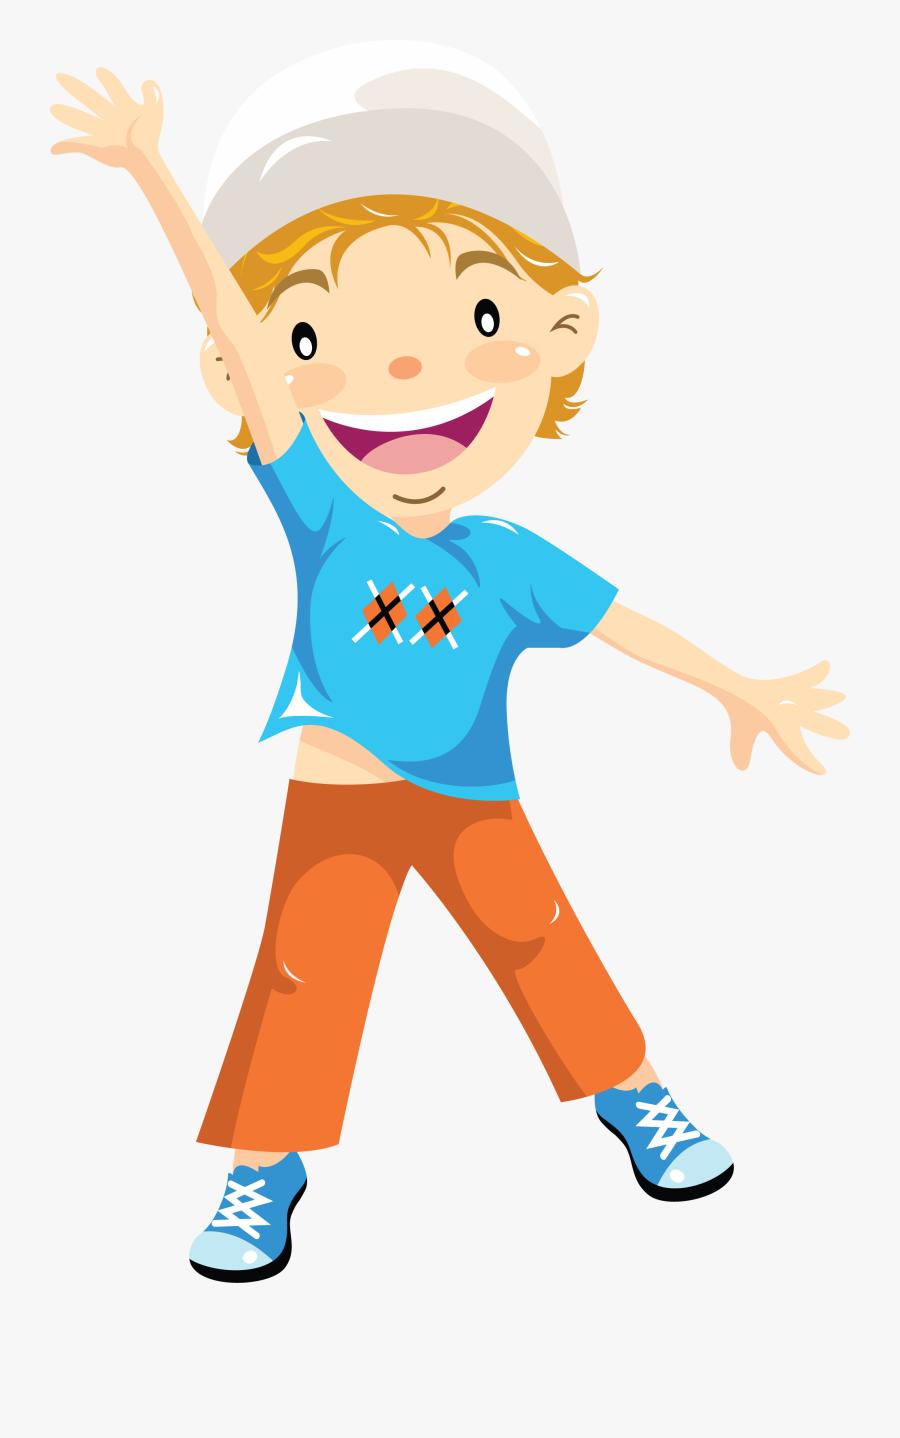 Тест A Тест Б Почетно Читање И Писање - Fun Kids Png, Transparent Clipart